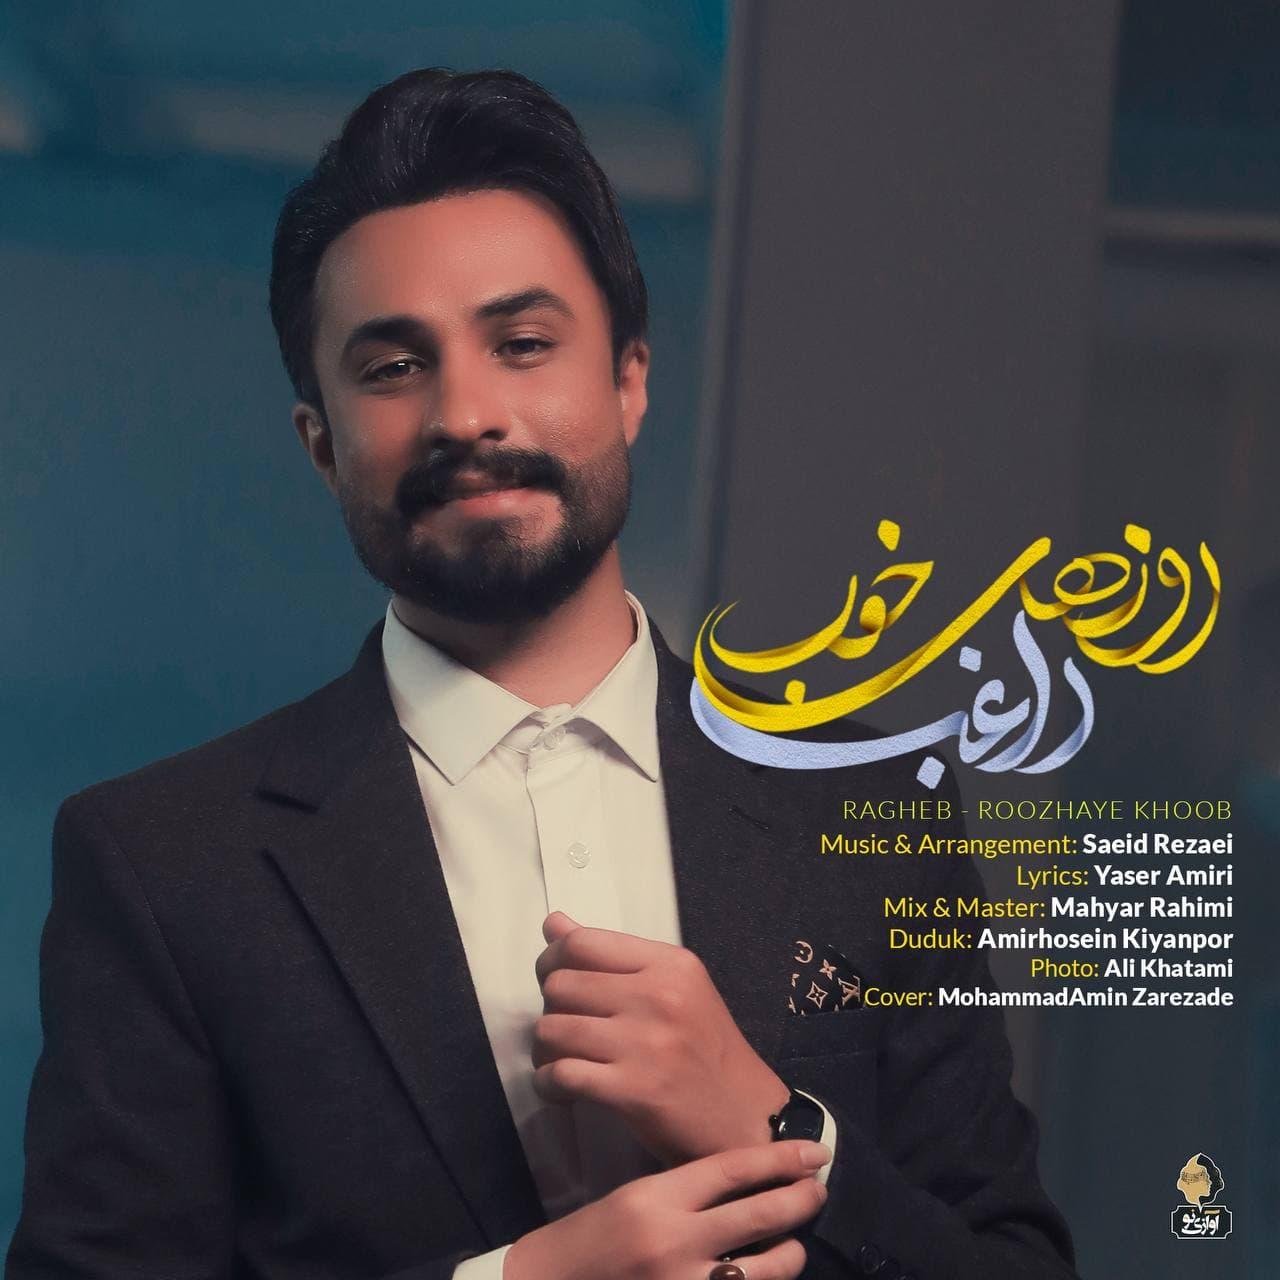 Ragheb - Roozhaye Khoob